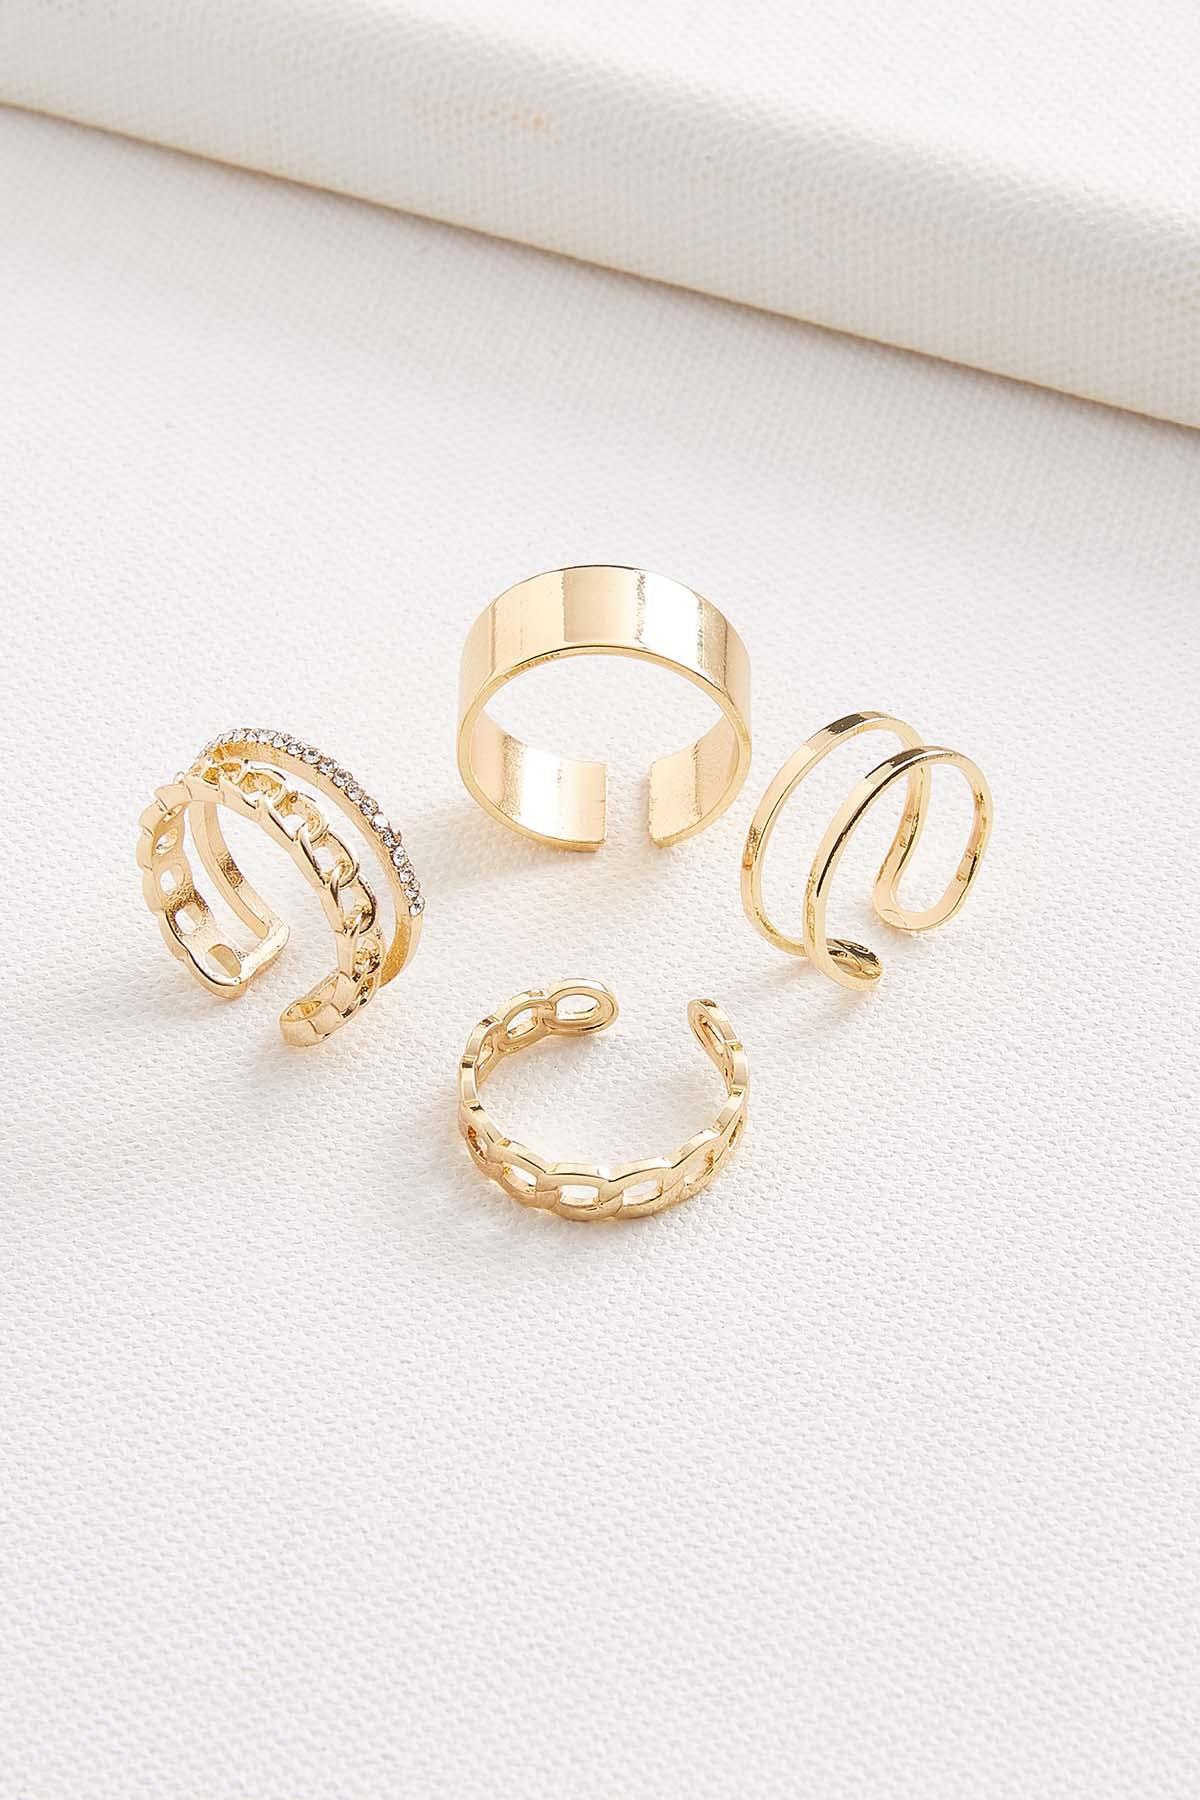 Chain Ring Set